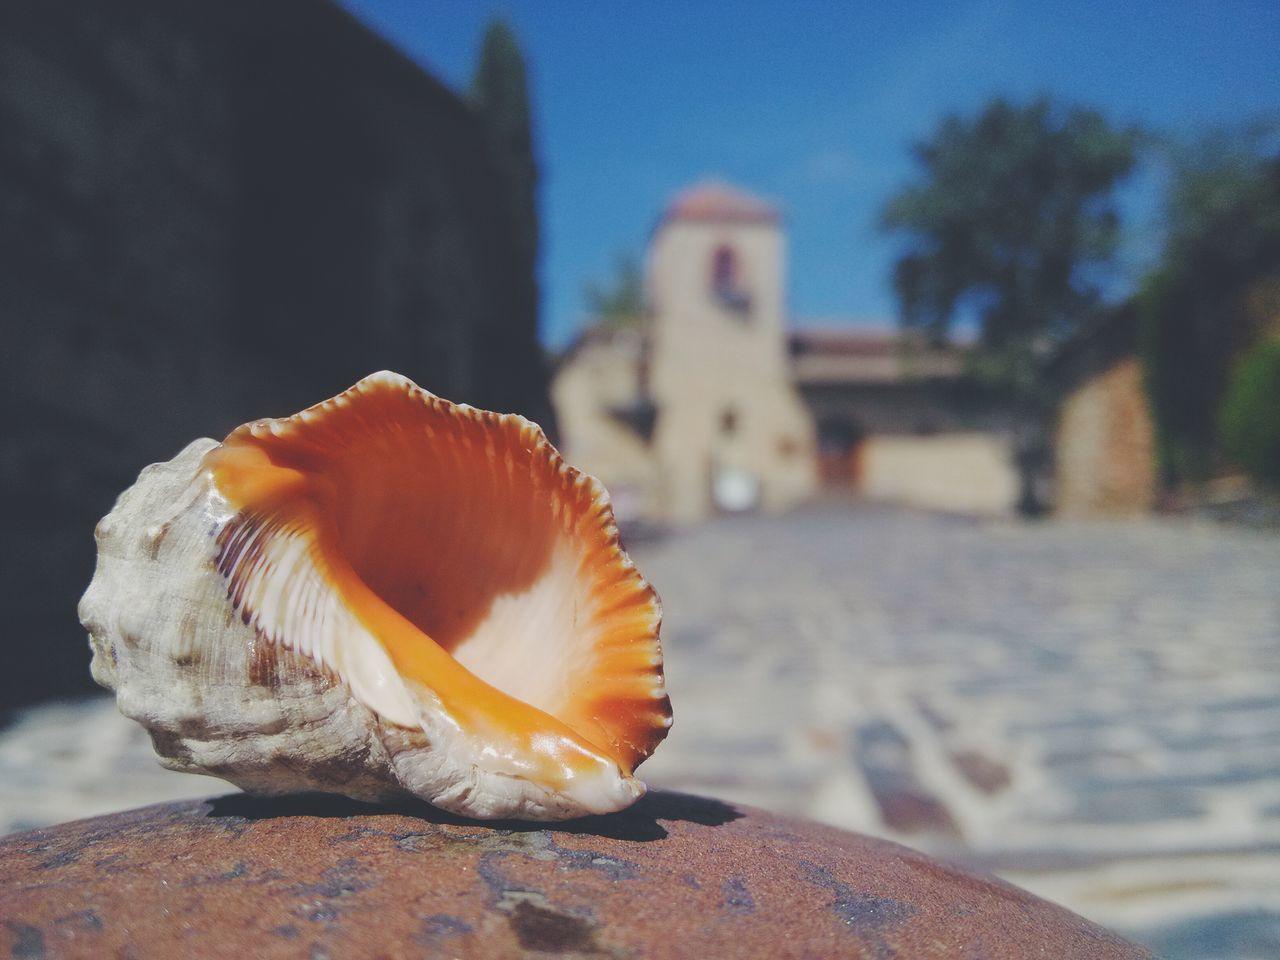 La caracola viajera vuelve al camino. Patones de Arriba, Madrid Caracolaviajera Eyeen Best Shots AMPt - My Perspective Dreams And Seashells